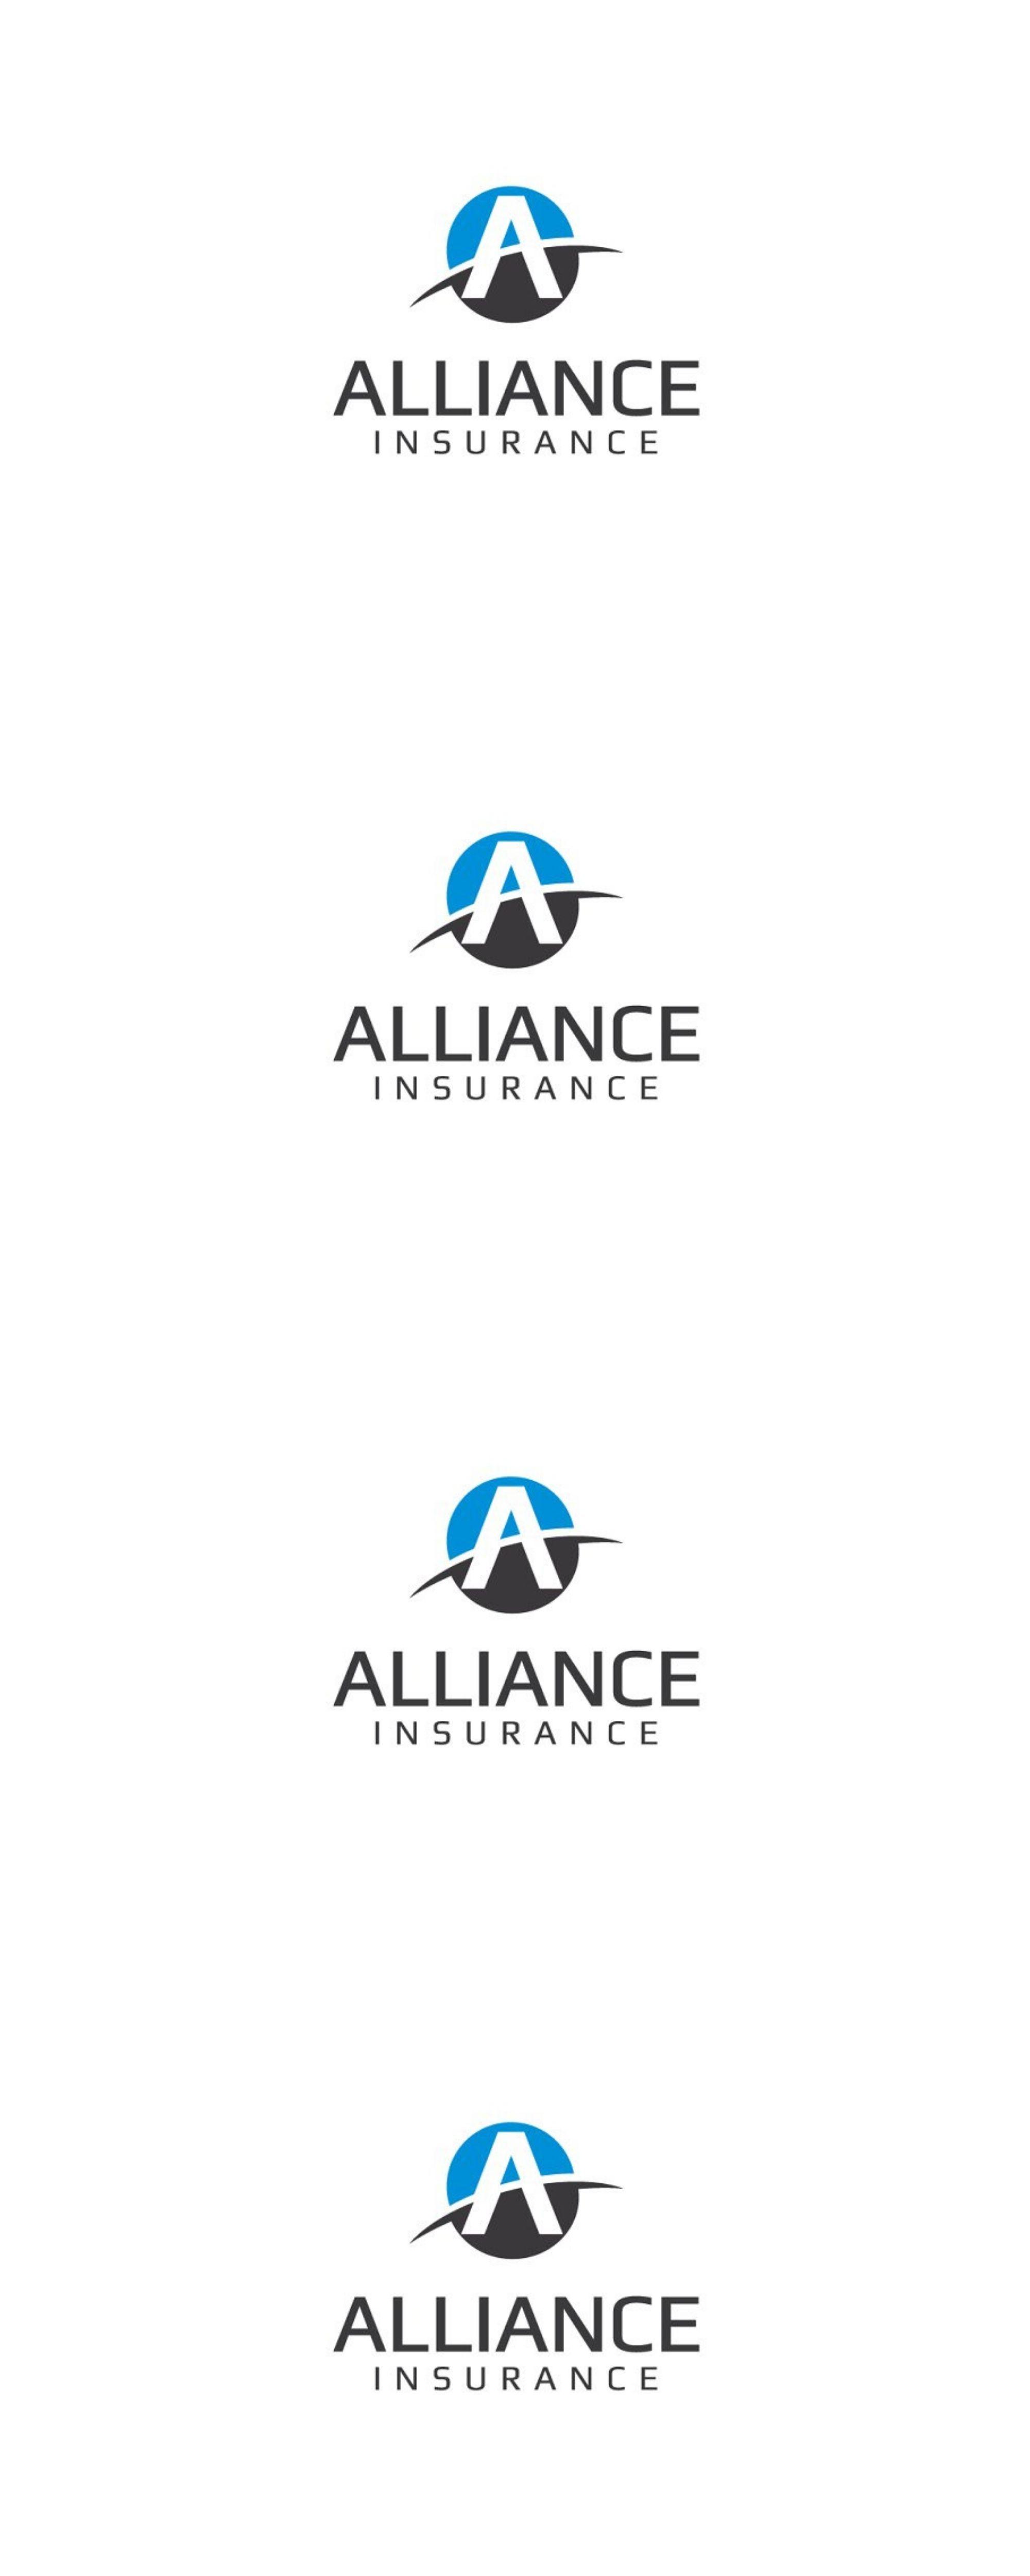 Alliance insurance logo template in 2020 logo templates